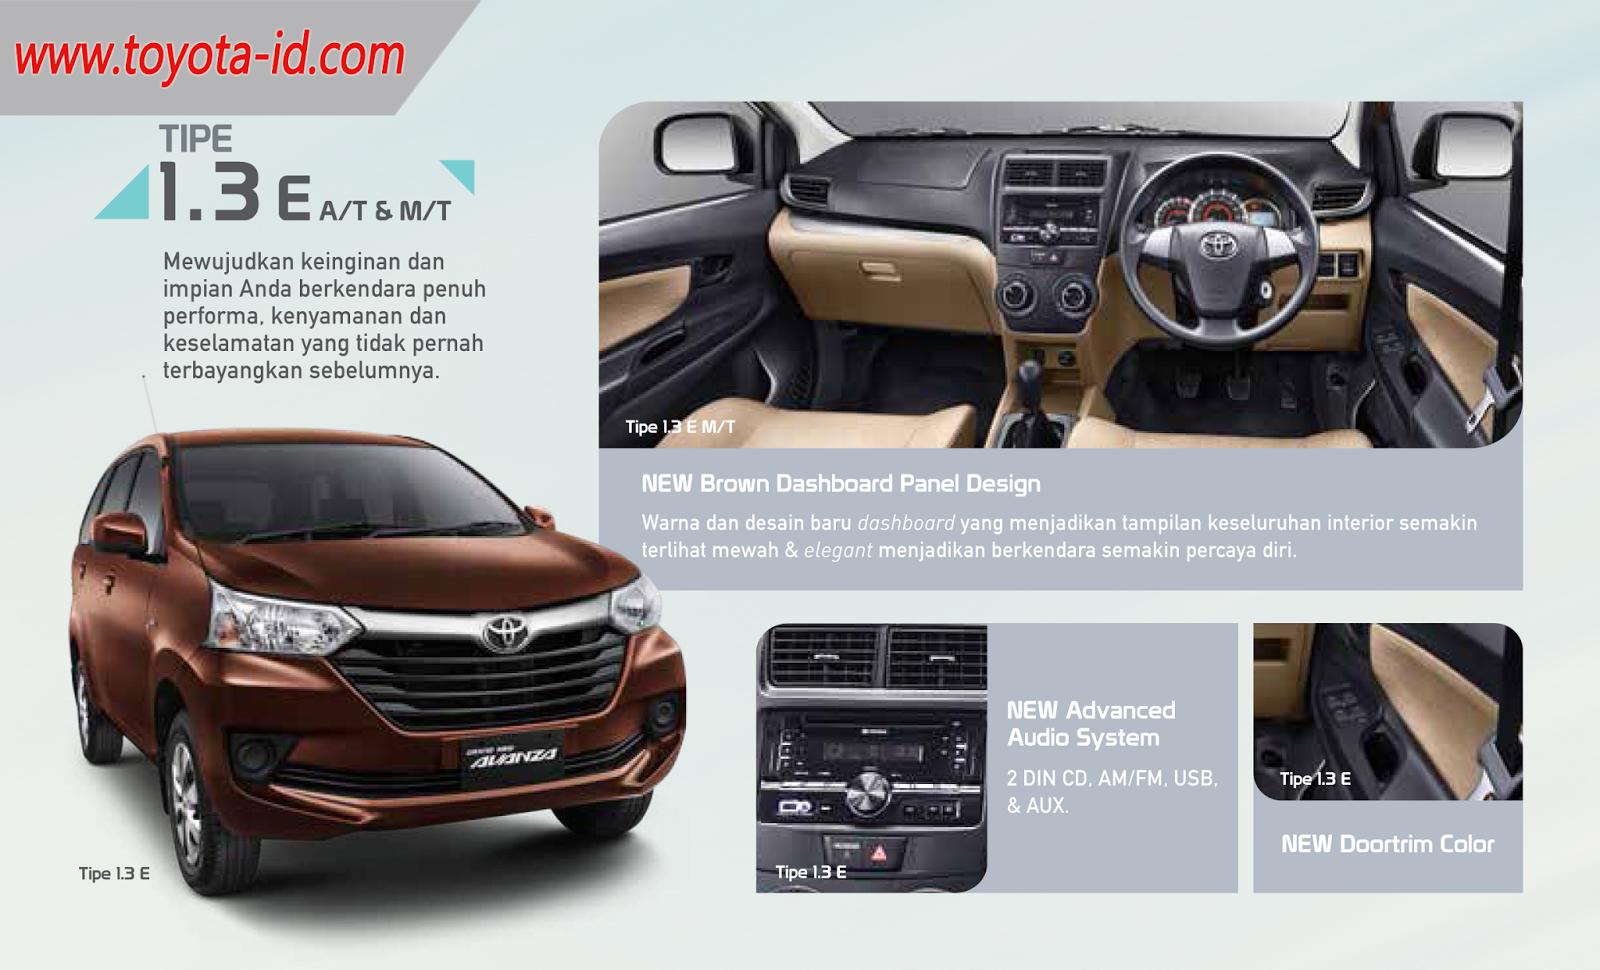 spesifikasi toyota grand new avanza 2015 | toyota astra indonesia